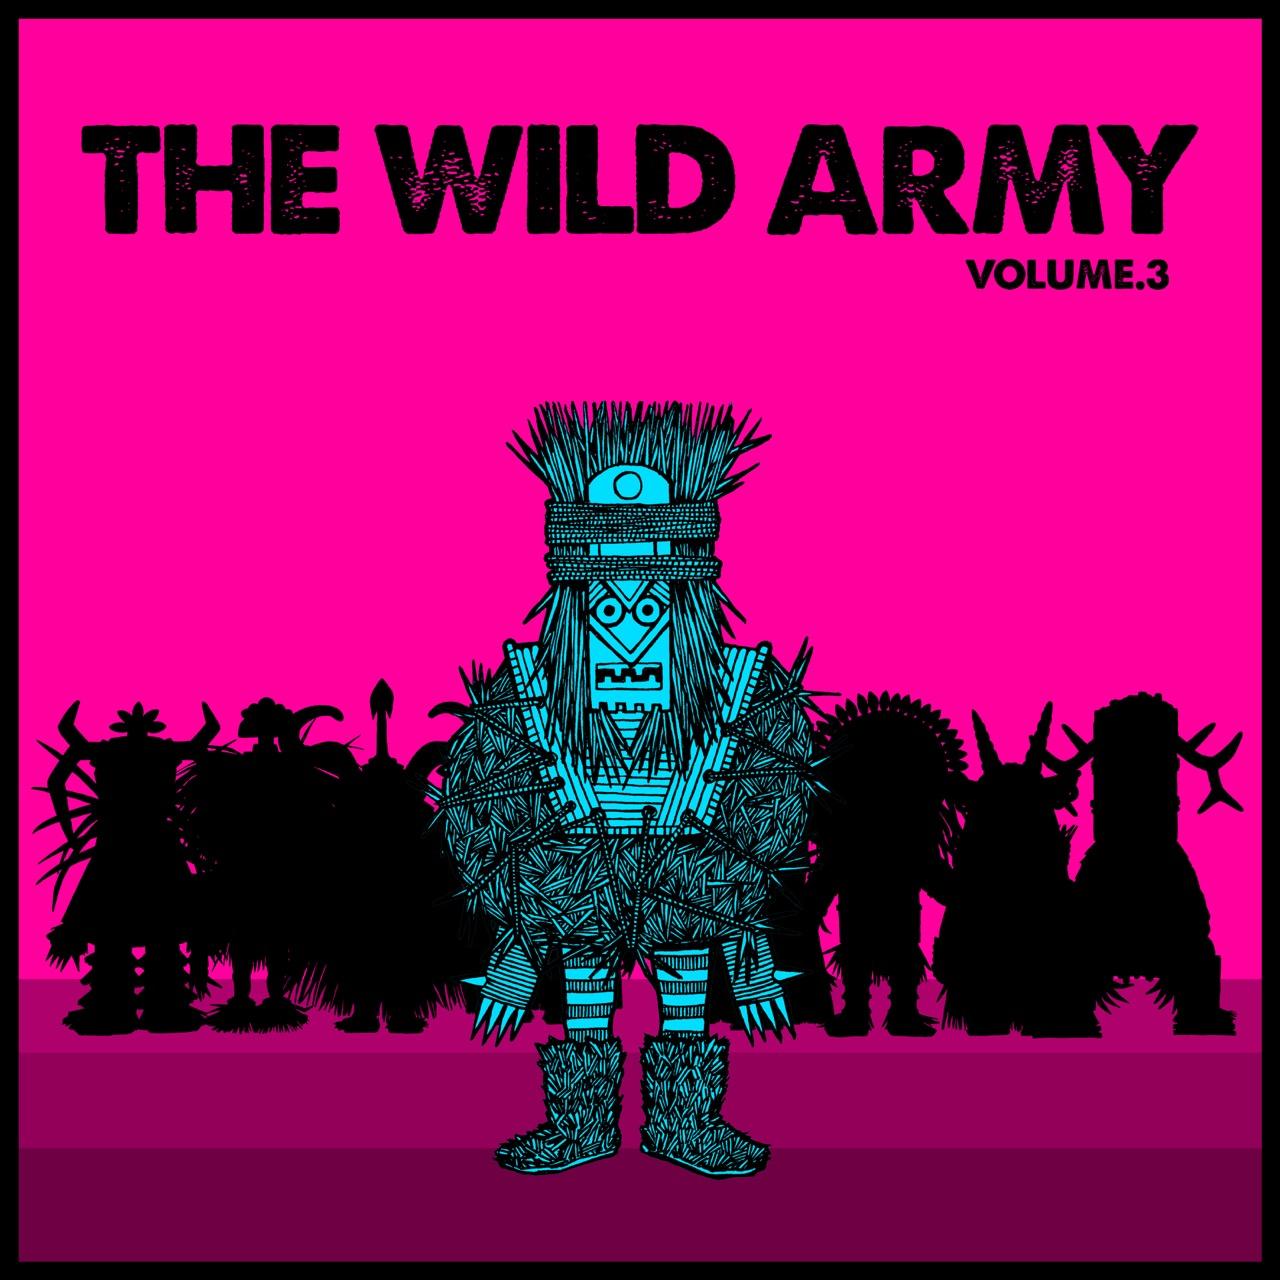 THE WILD ARMY VOL 3.jpg